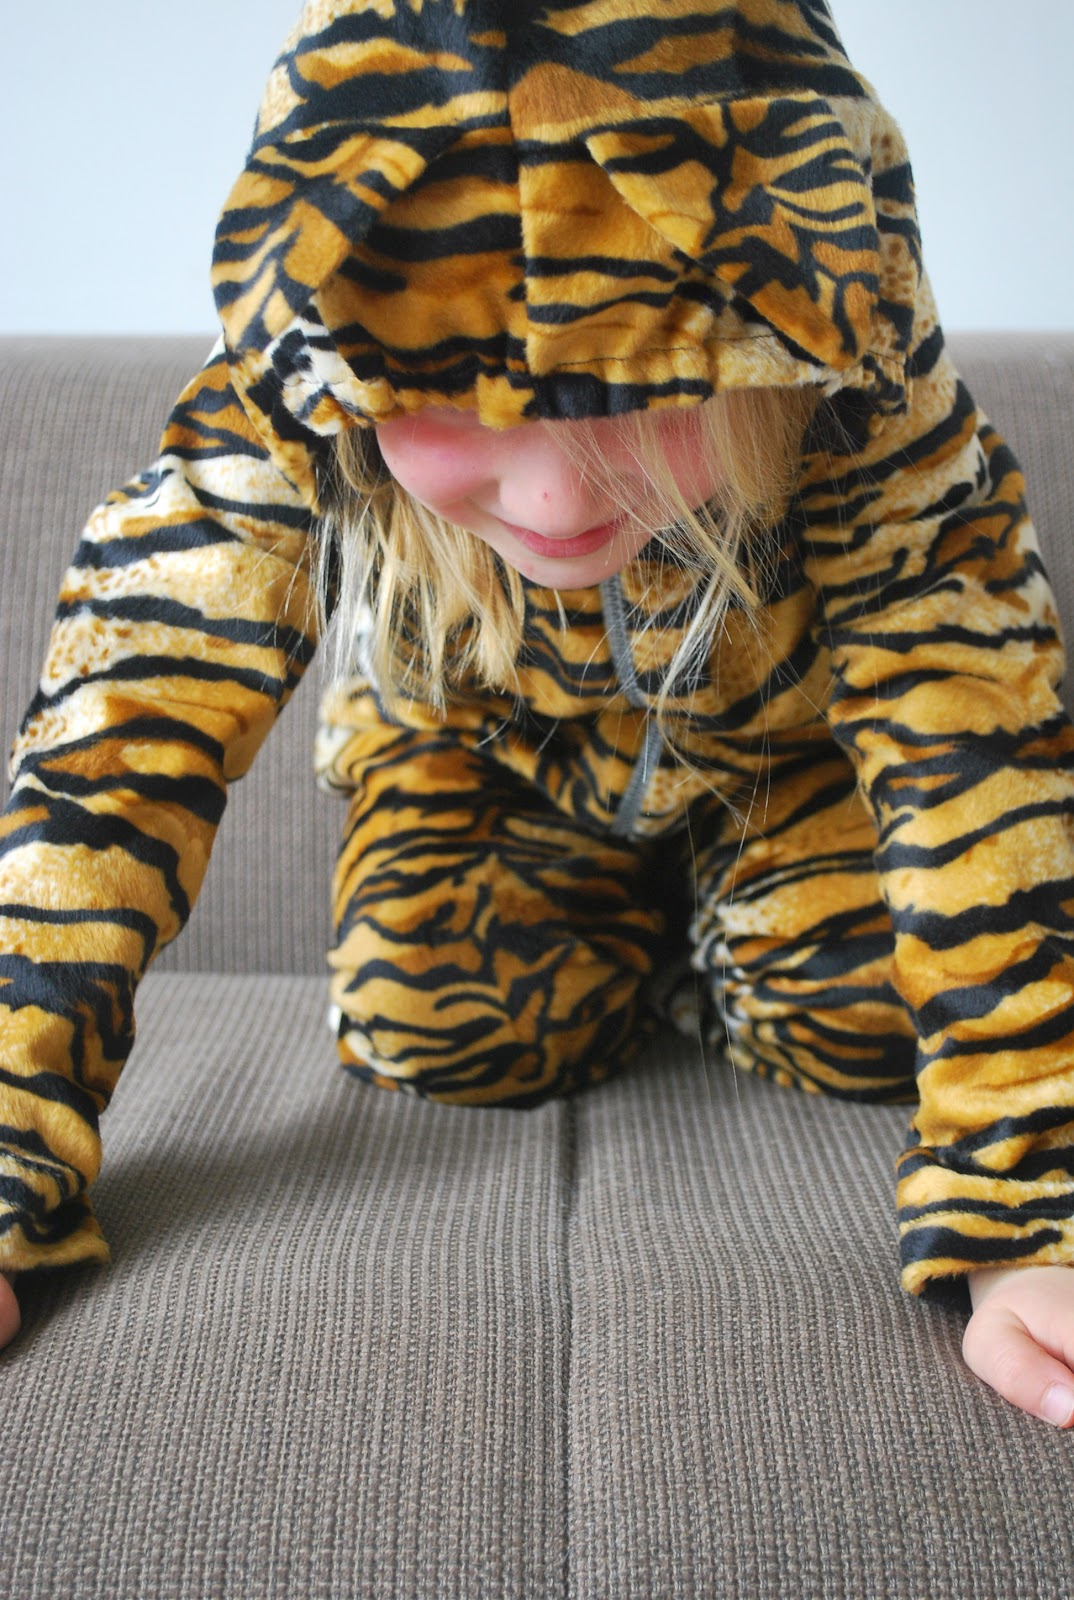 tijger pak maken